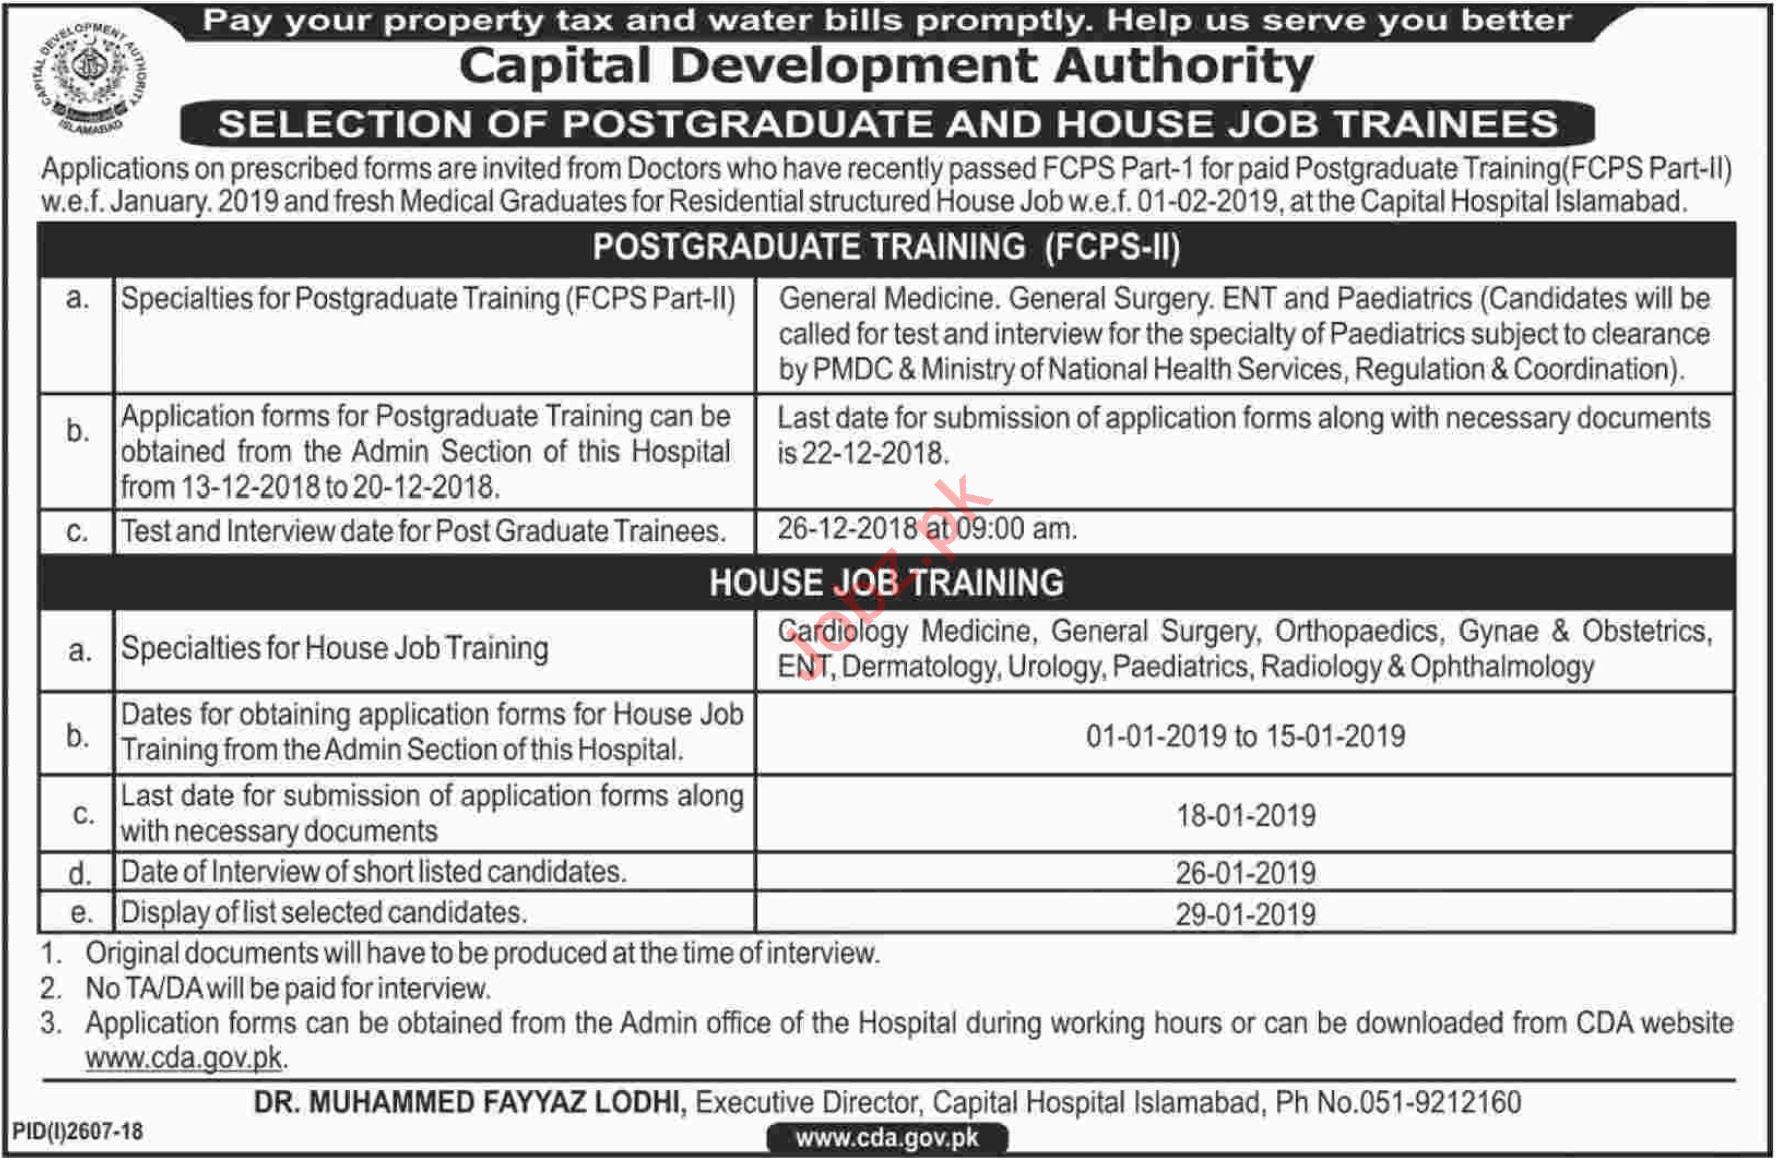 CDA Hospital Islamabad FCPS House Job Training 2019